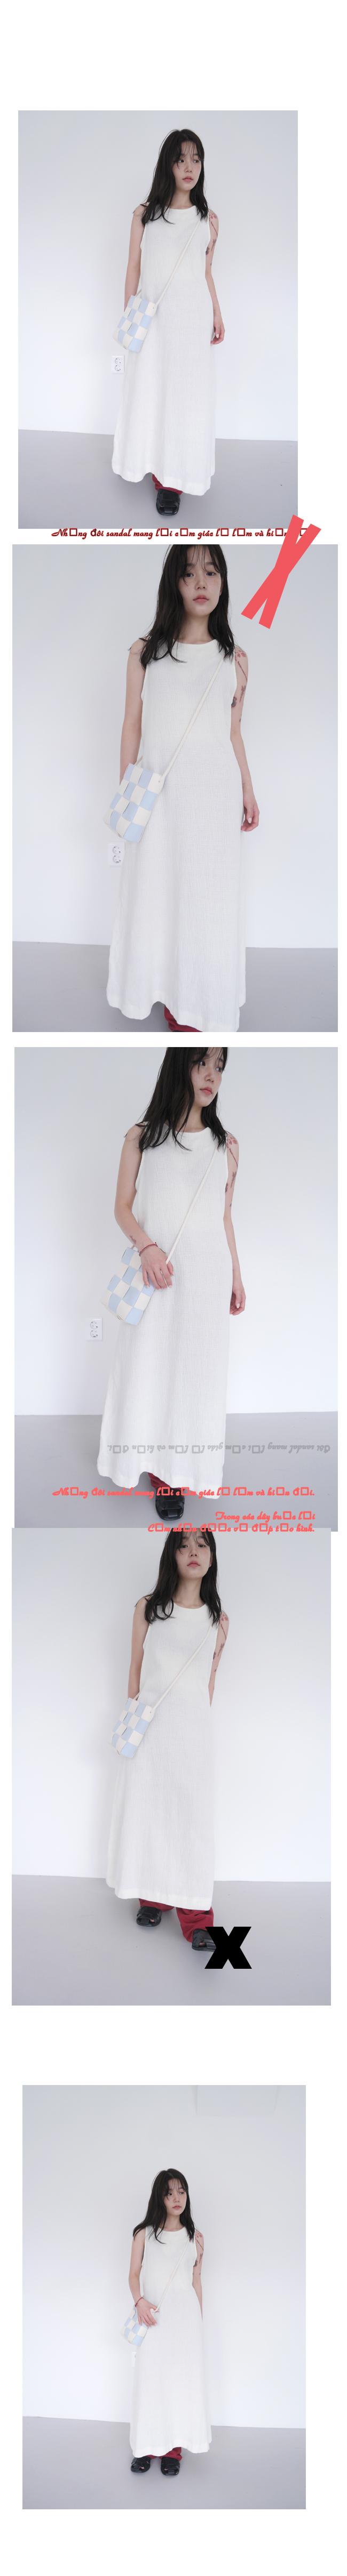 wearable comfy banding PT